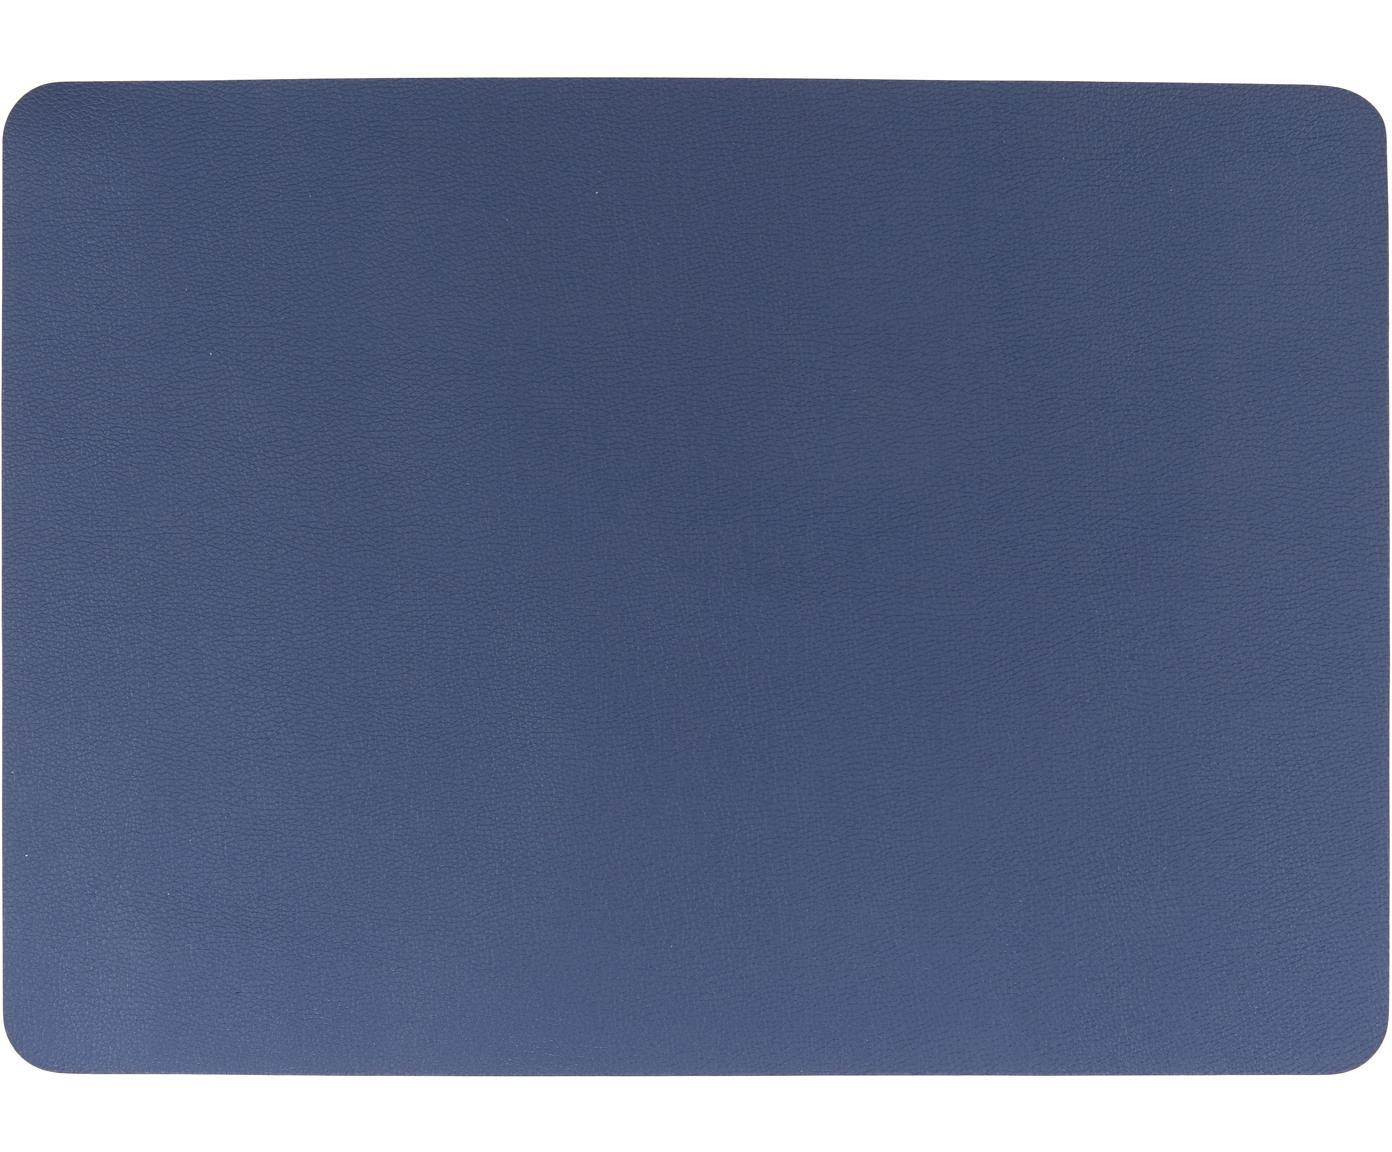 Placemats Pik, 2 stuks, Kunststof (PVC), Marineblauw, 33 x 46 cm